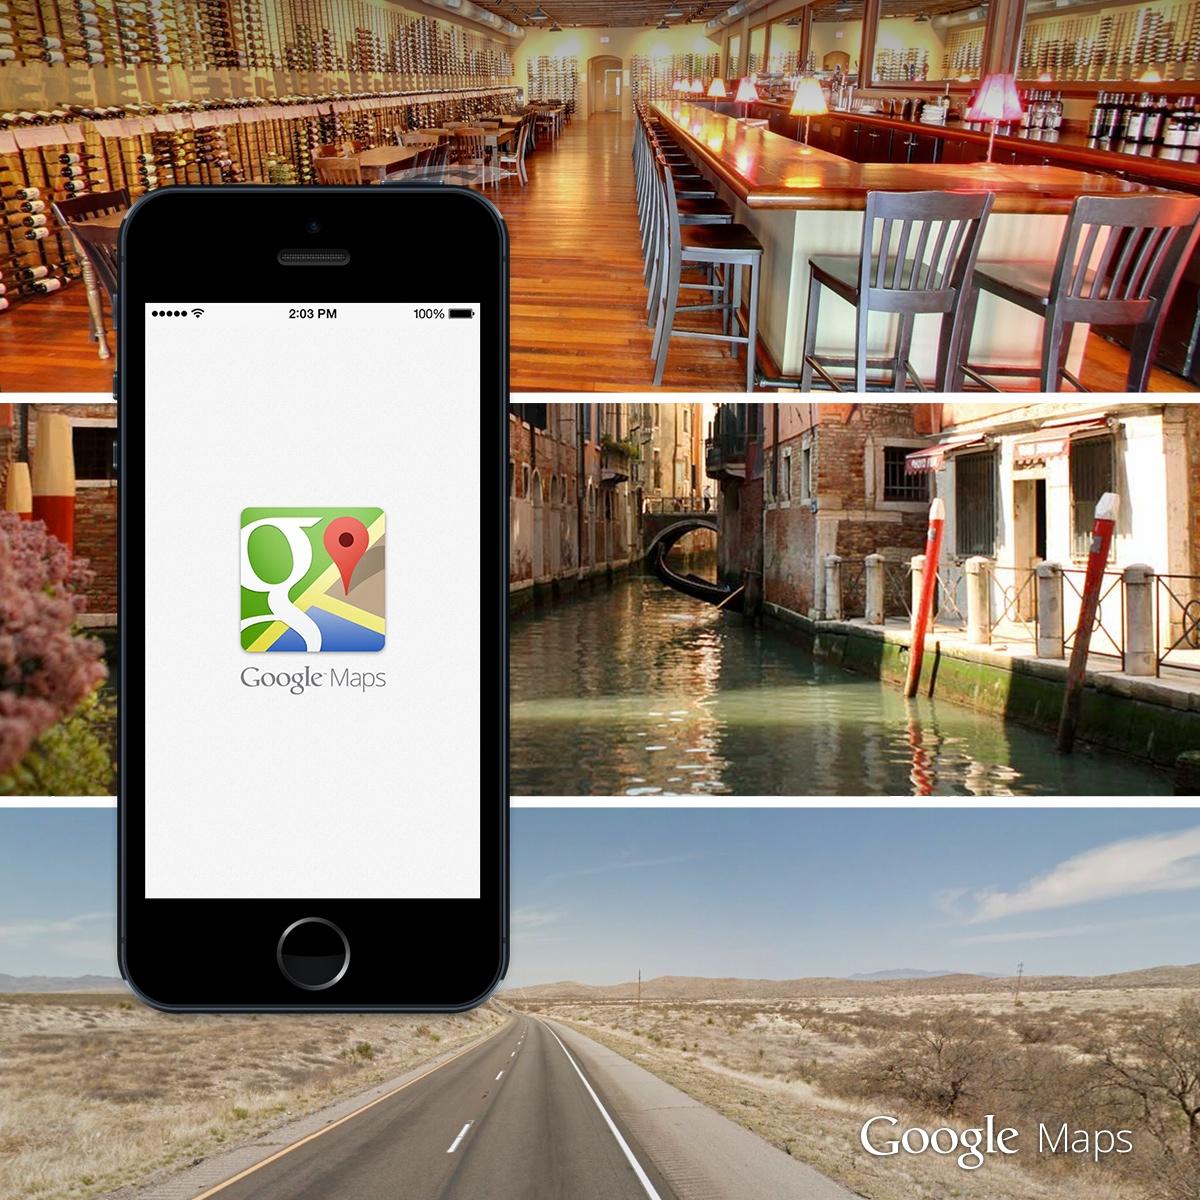 Google Maps 3.0 Offers Offline Maps, Lane Guidance, Uber Integration and More